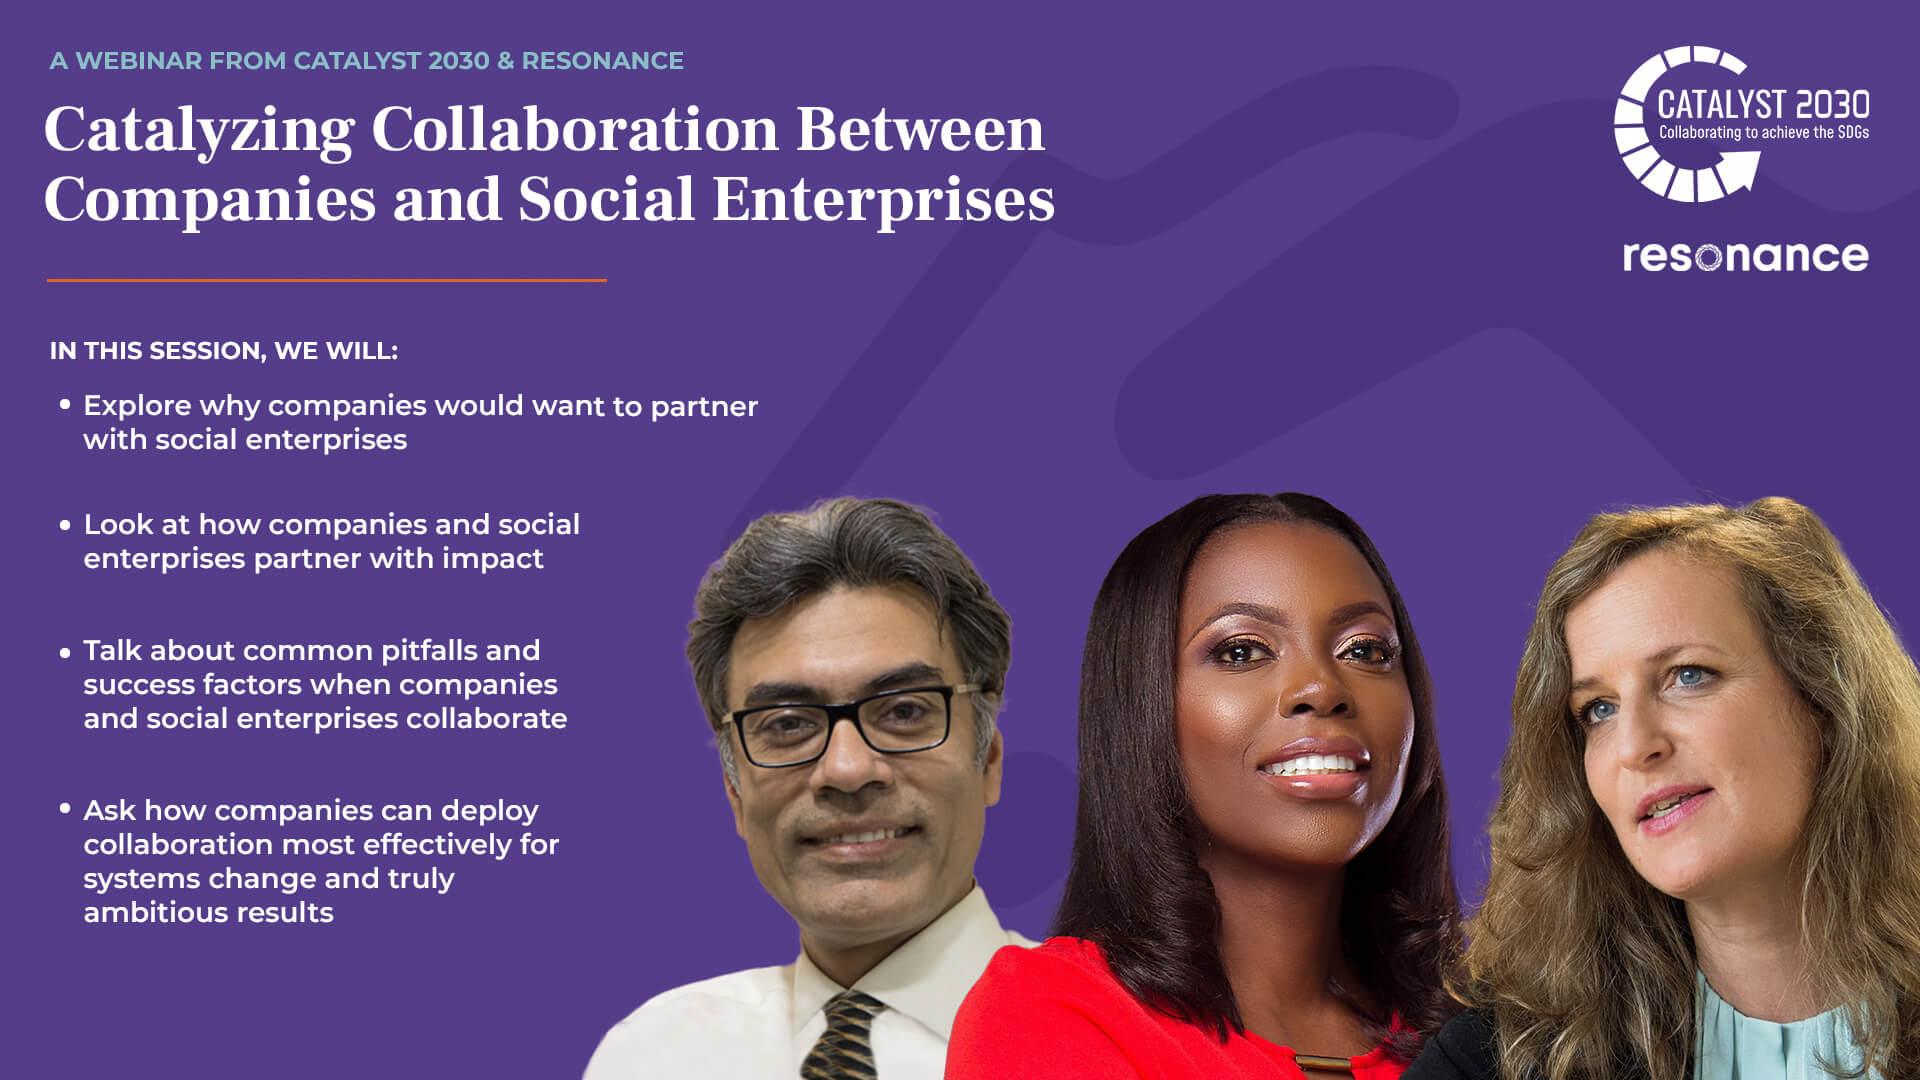 OnDemand - Catalyzing Collaboration Between Companies and Social Enterprises